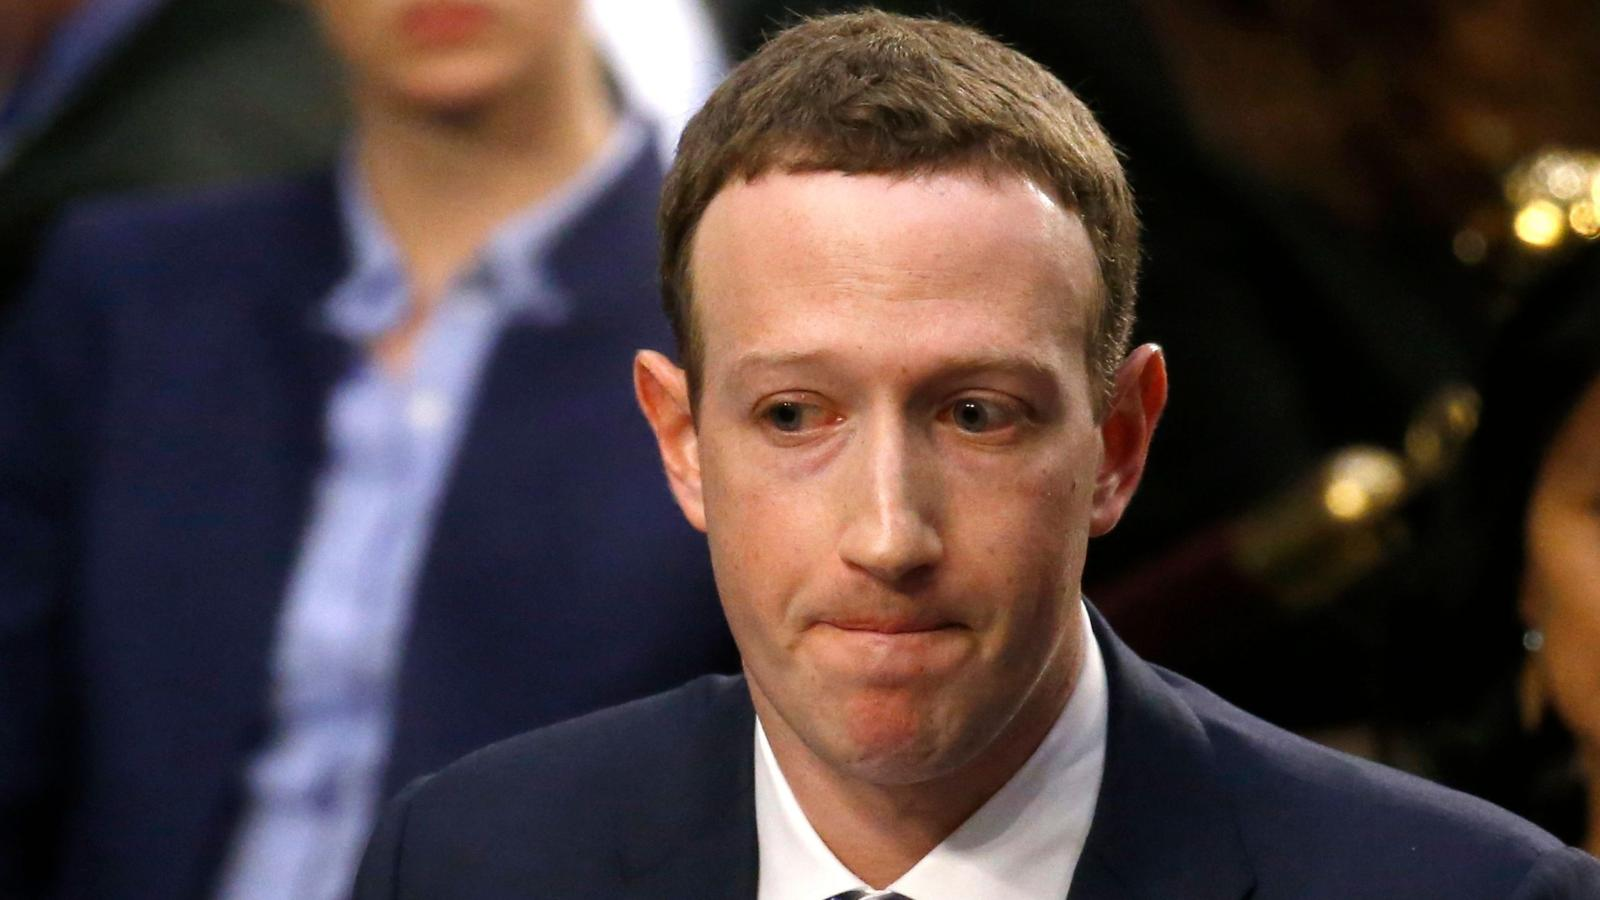 zuckerberg-russia-facebook-shell-companies-e1523467315626